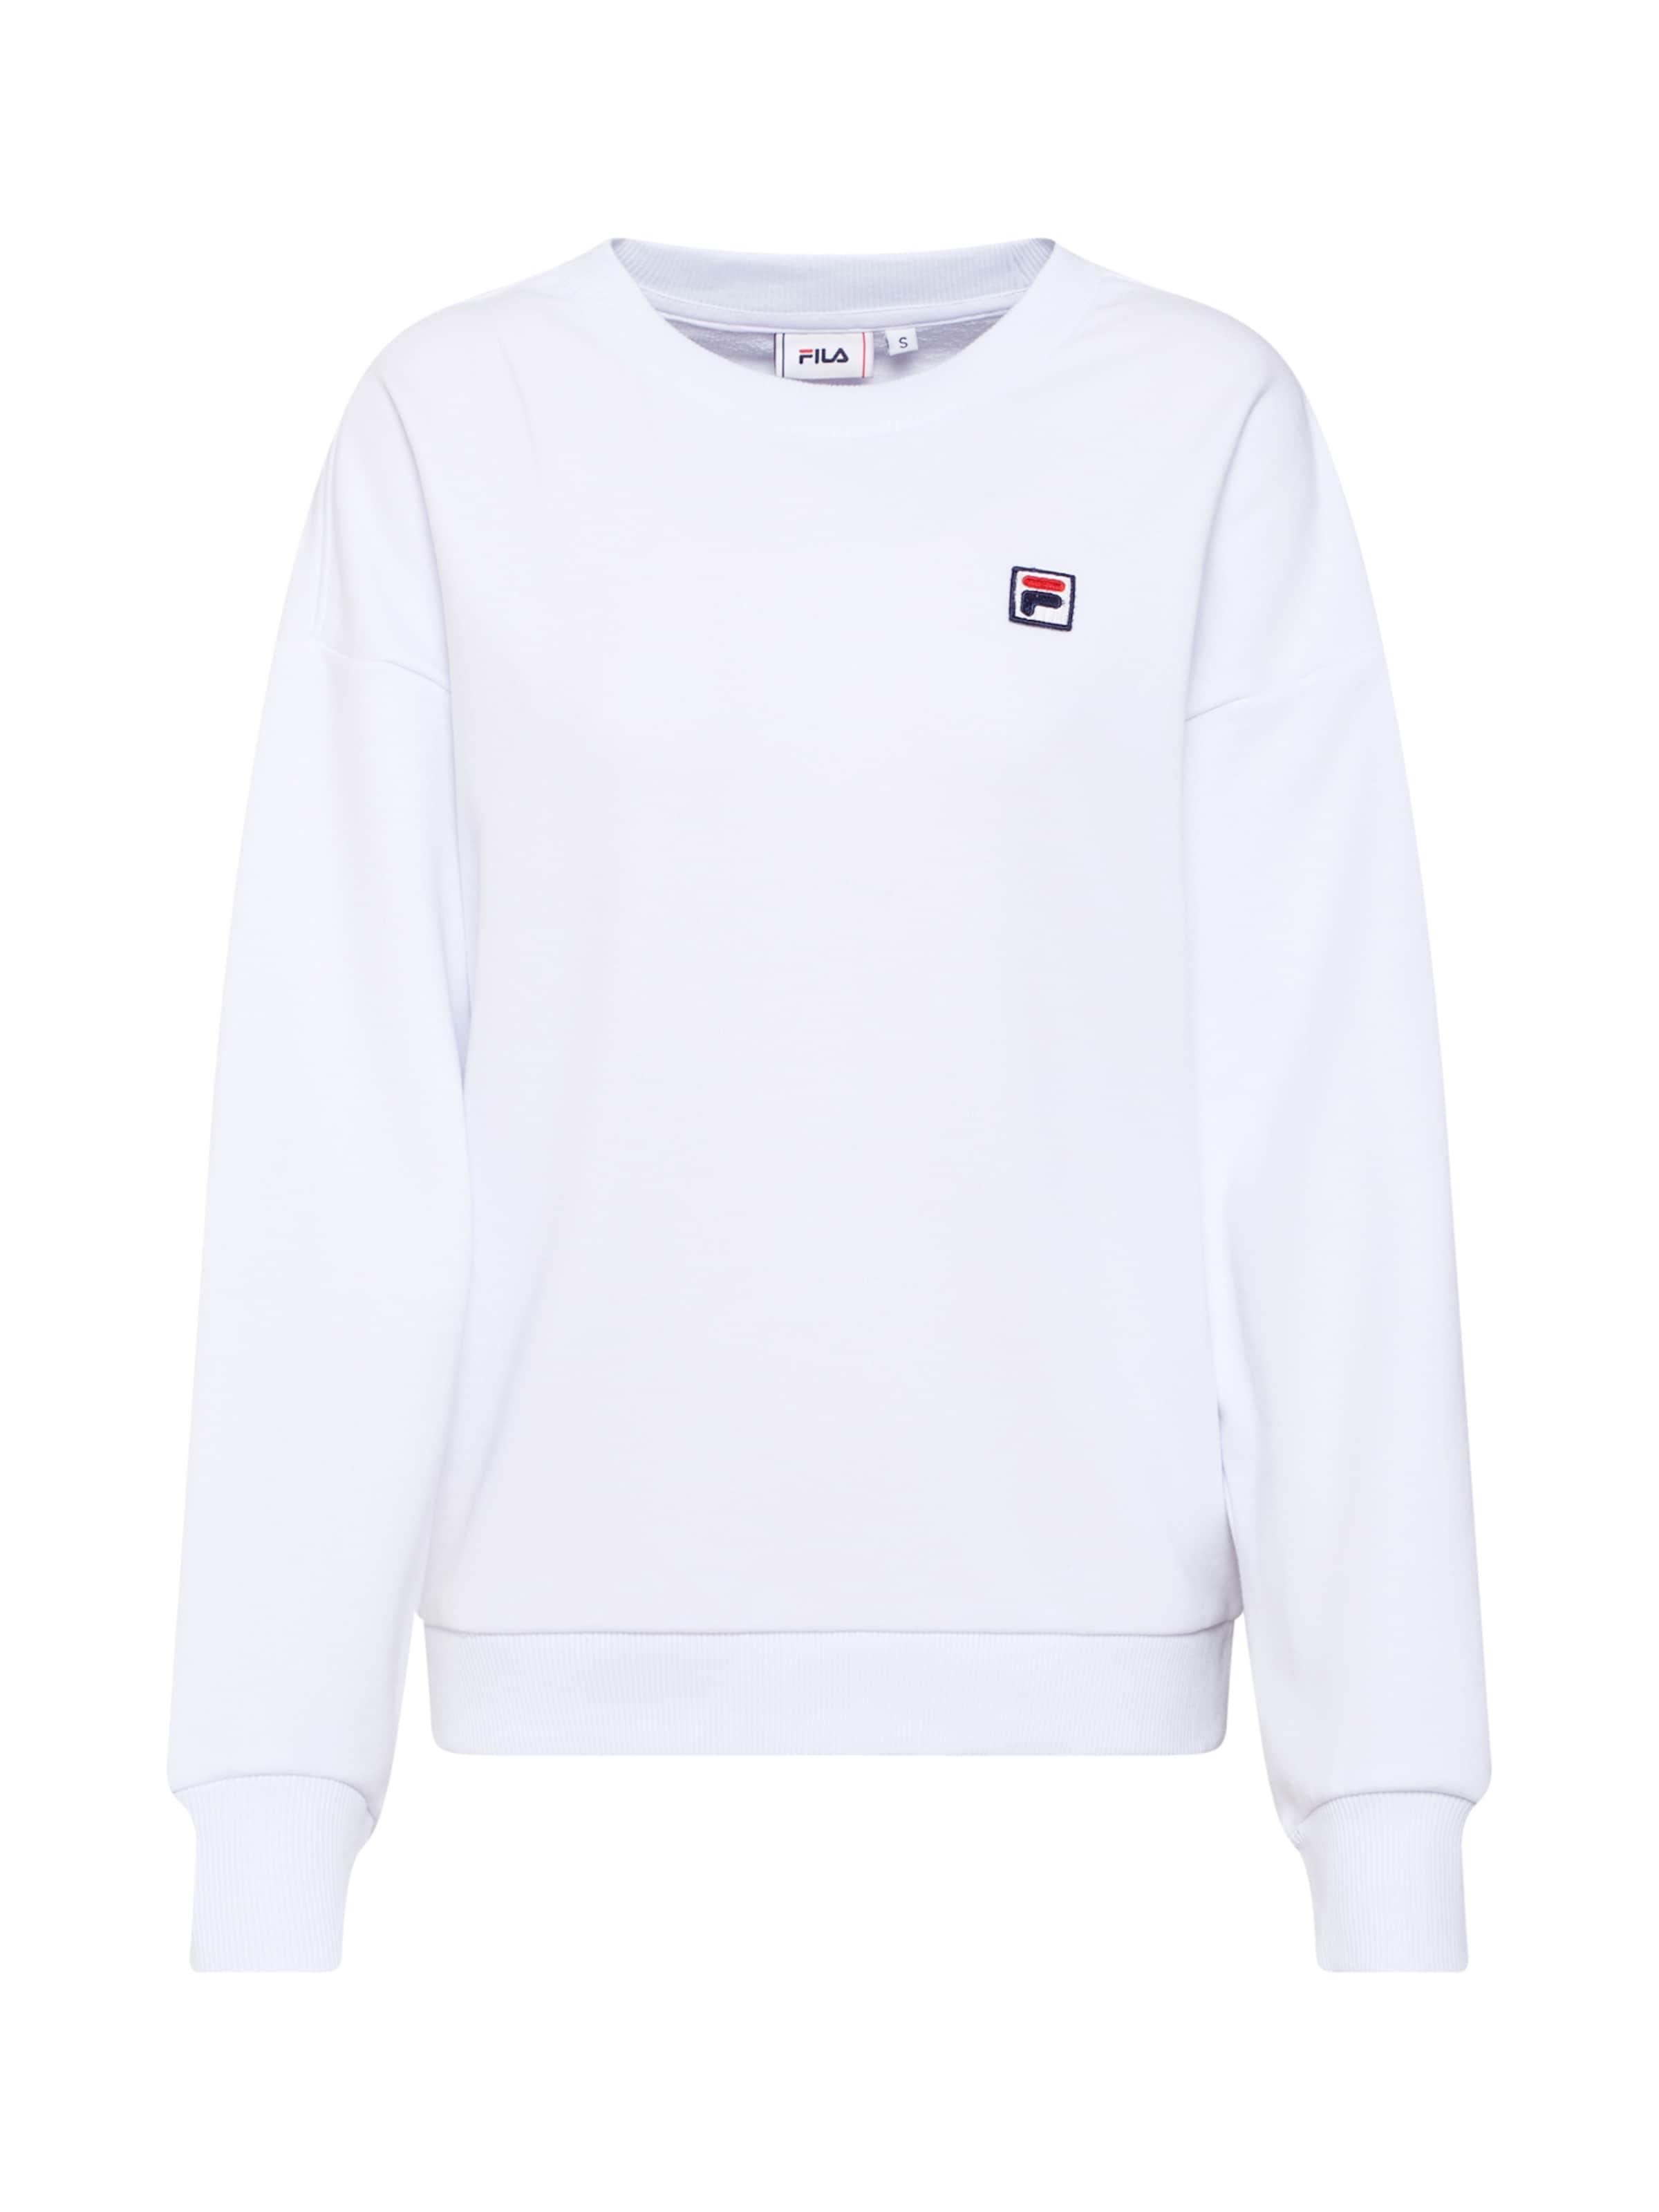 FilaSweat shirt In shirt 'suzanna' FilaSweat Blanc 'suzanna' SMzpqLUVG